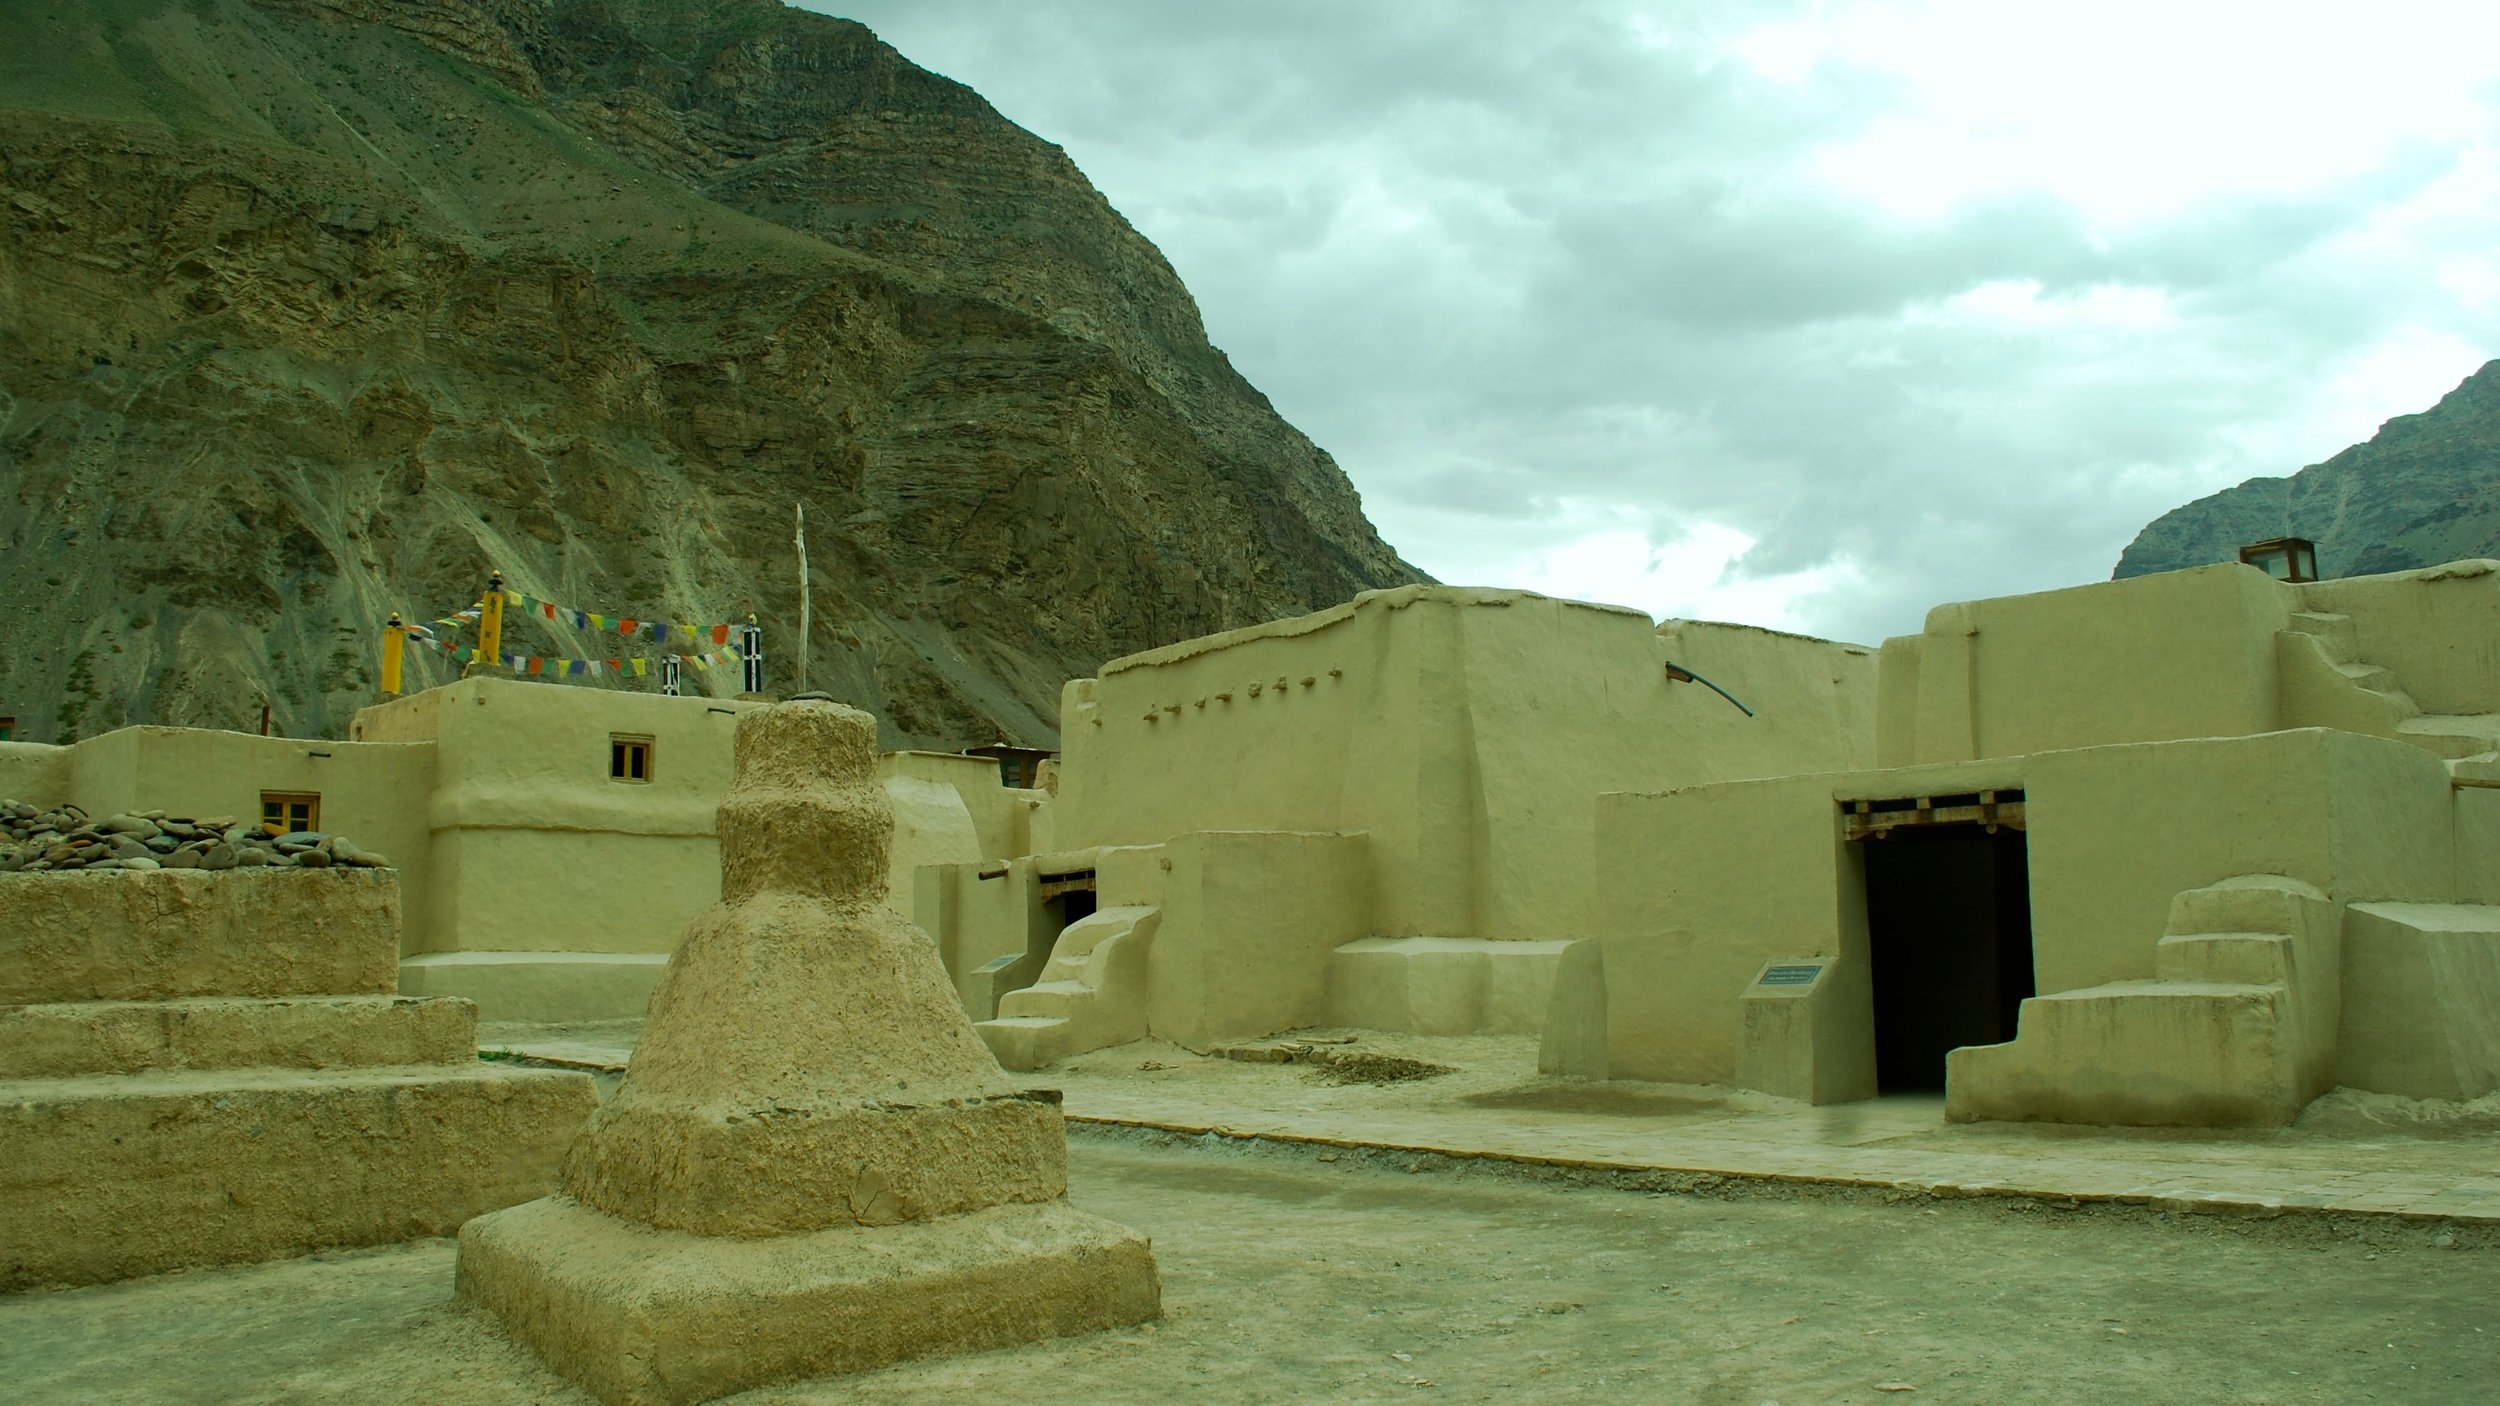 India-Spiti-Tabo-Monastery.jpg